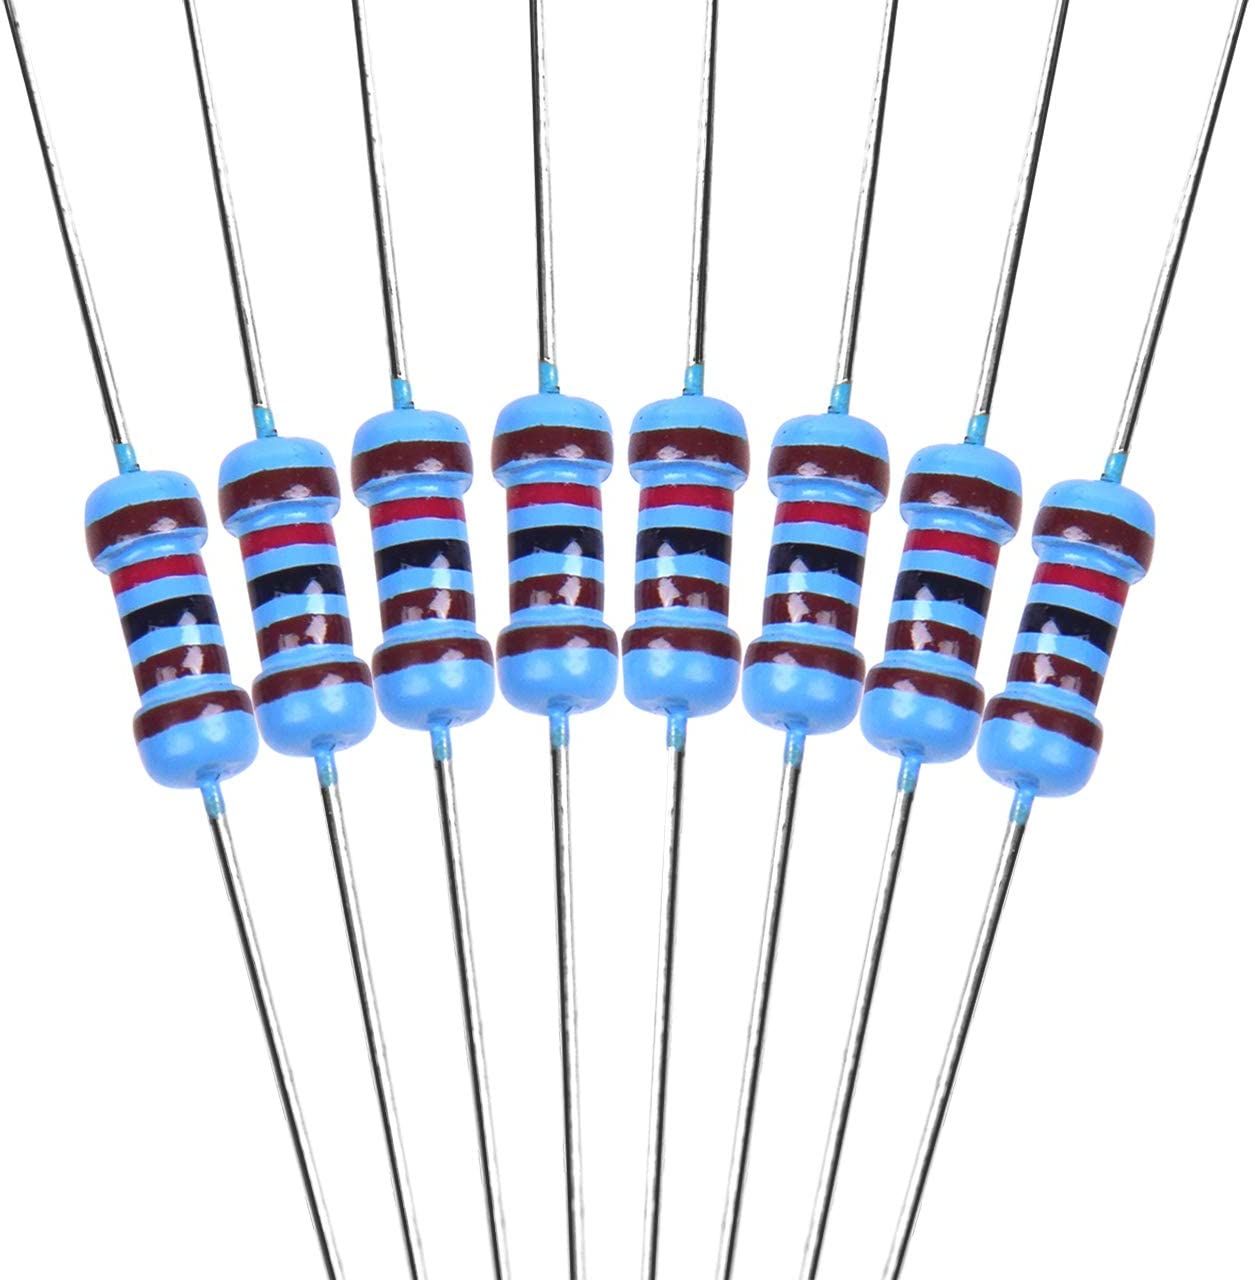 0.25 Watt /±1/% Tolerance Metal Film Fixed Resistor Assortment for DIY and Experiments DEDC 1000 Pieces 1K ohm Resistor 1//4w